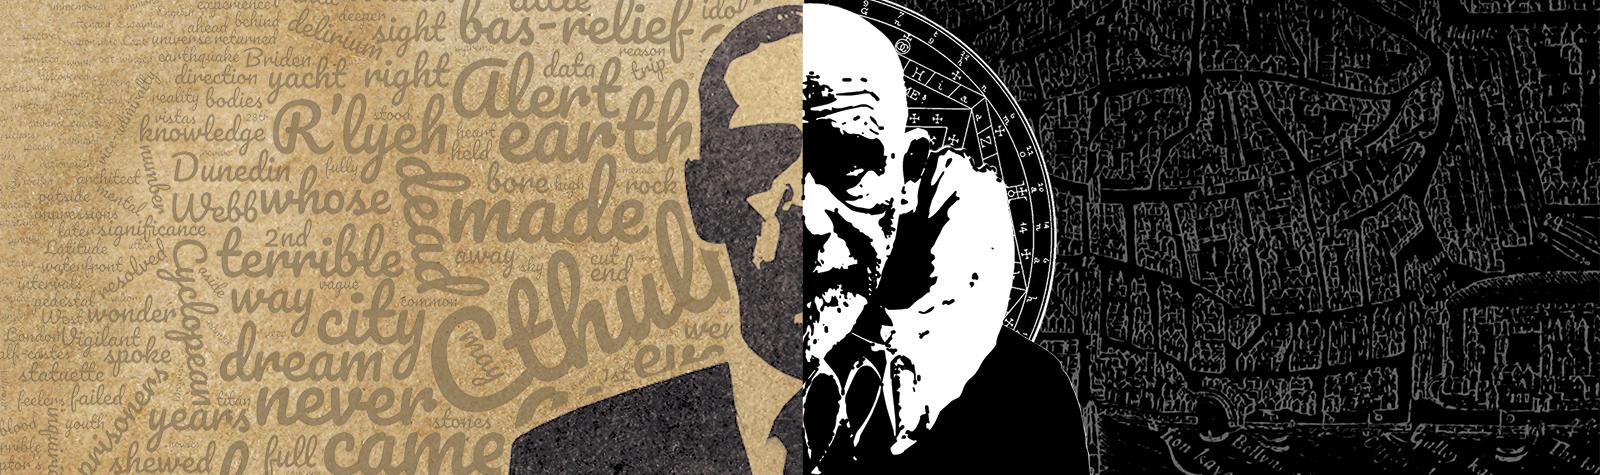 2021-Dee-Lovecraft-banner.jpg